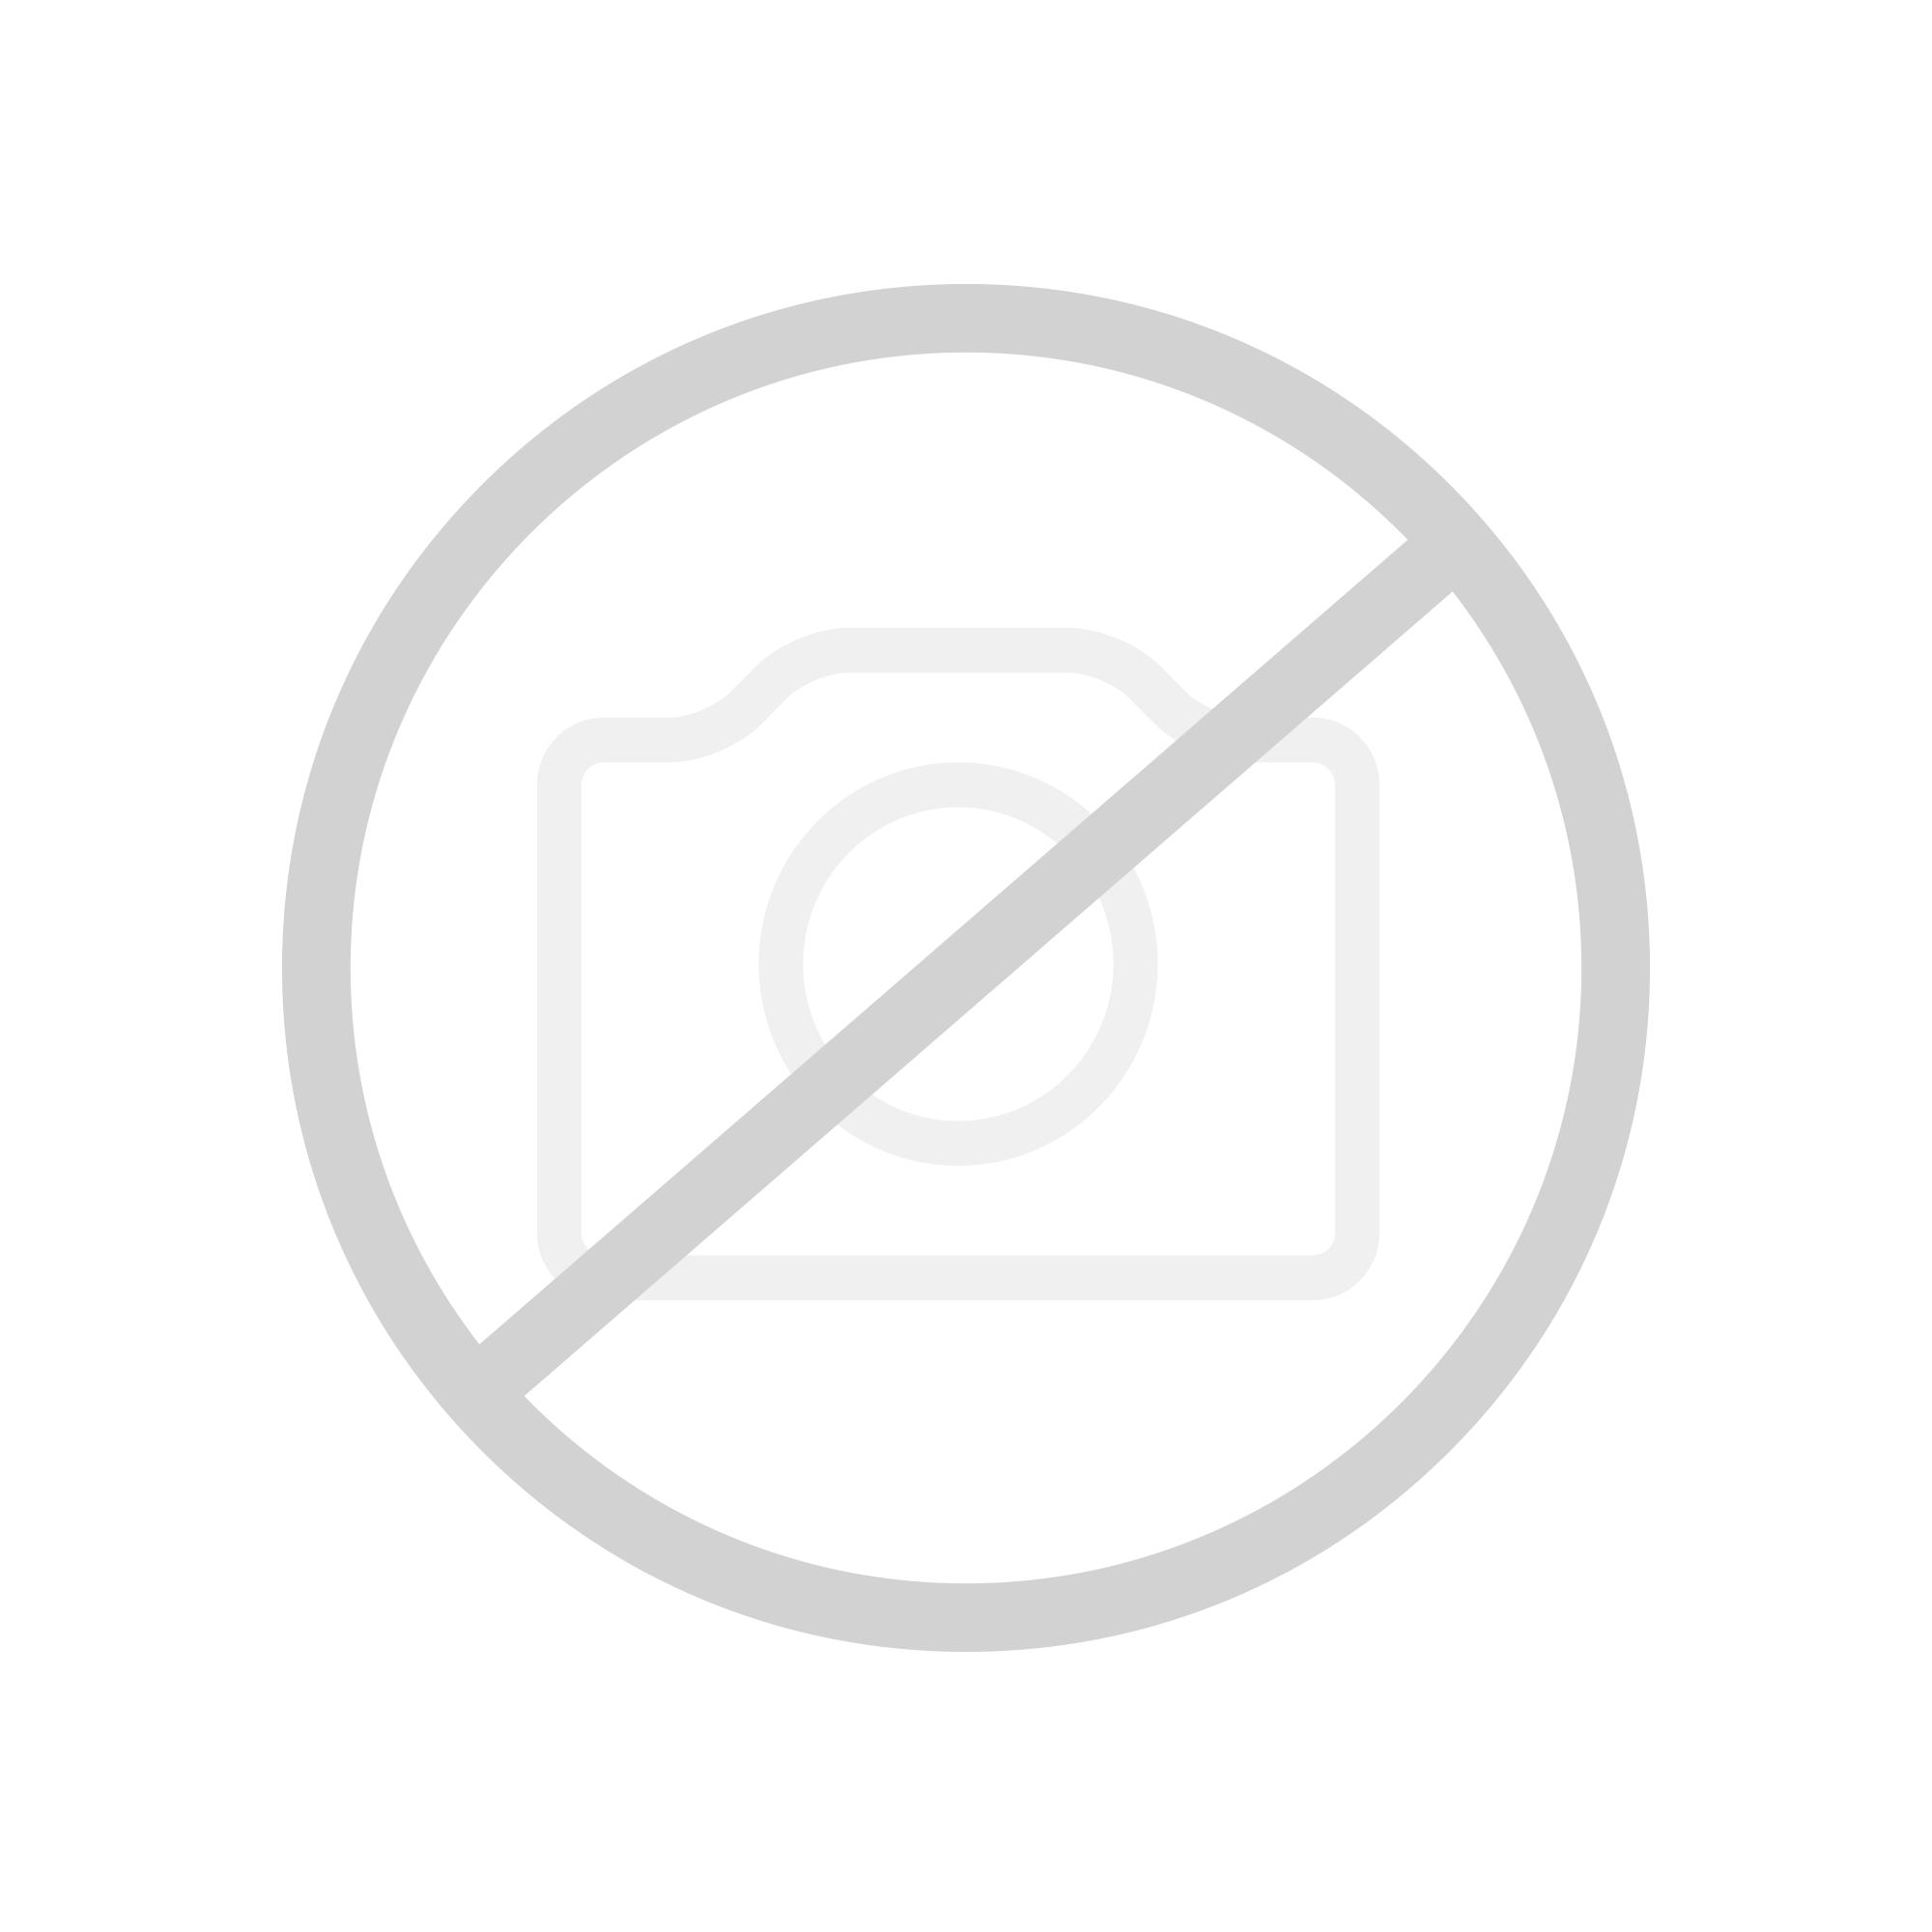 kaldewei twin pool sechseck badewanne wei perl effekt 228100013001 reuter onlineshop. Black Bedroom Furniture Sets. Home Design Ideas